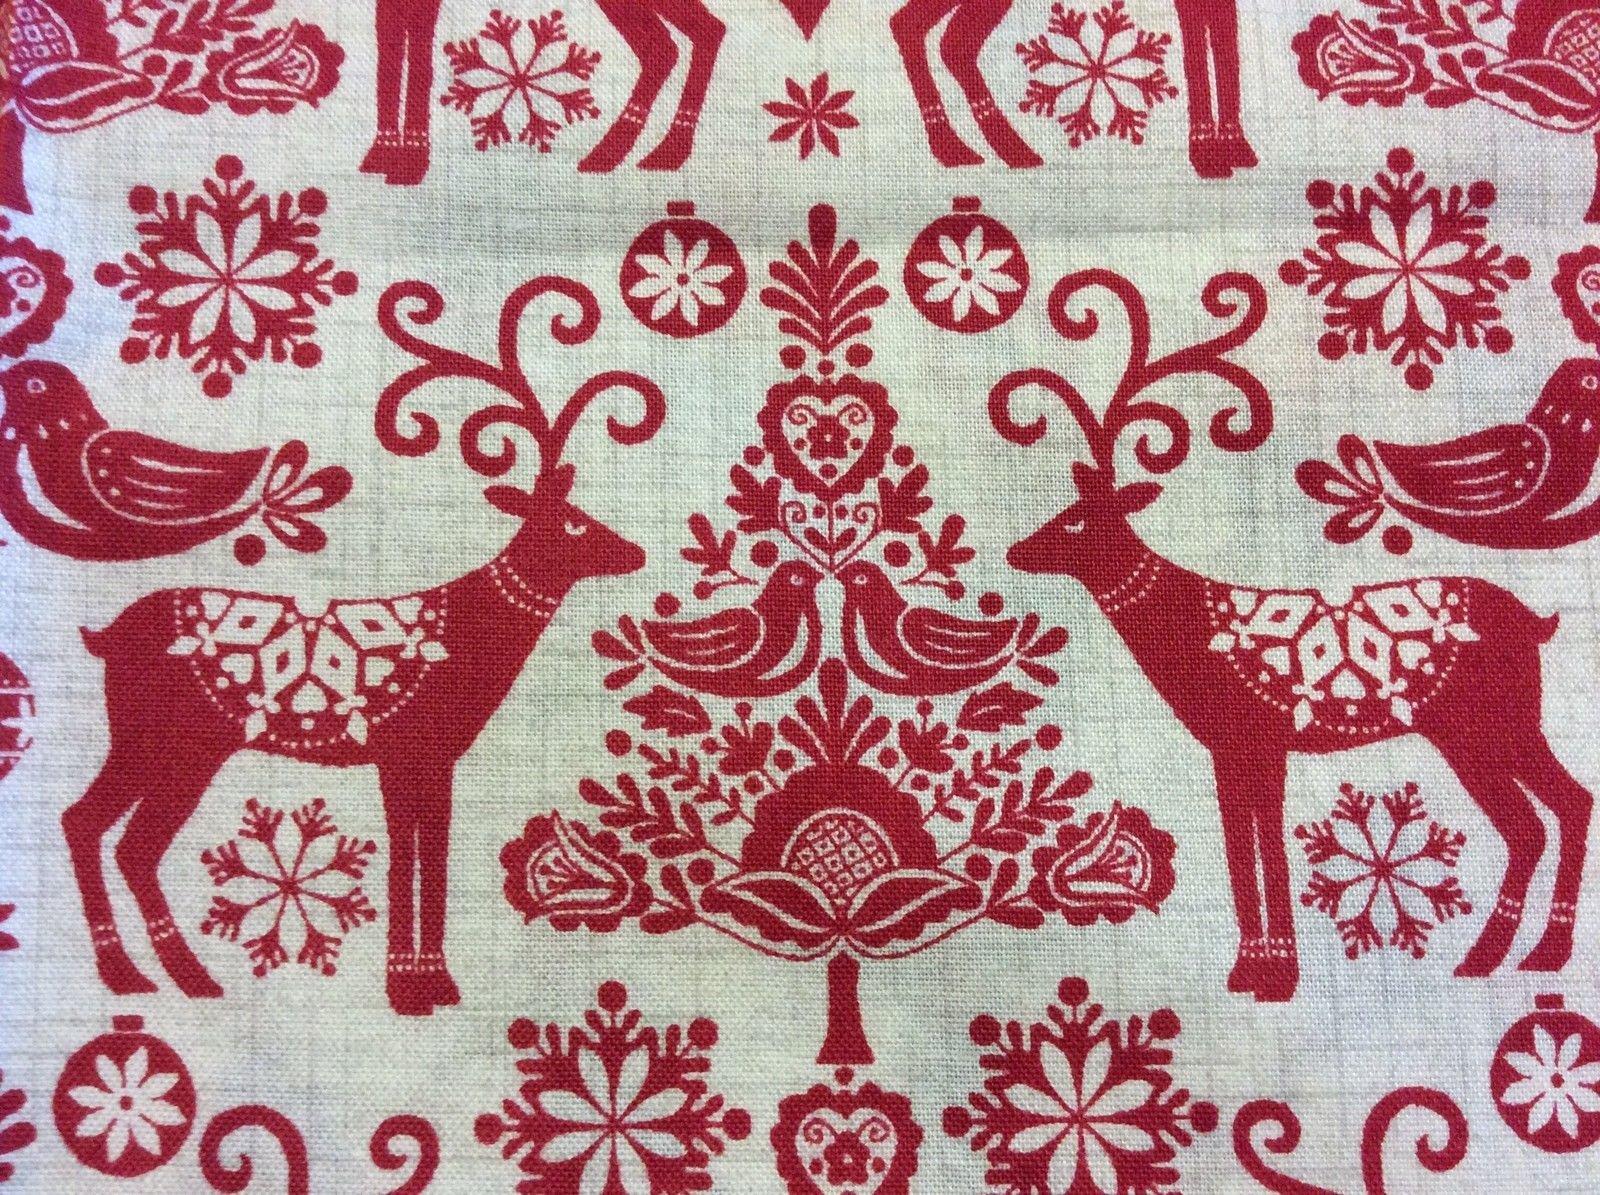 Retro Christmas Danish Modern Reindeer Paper Cut Cotton Quilting Fabric MA01